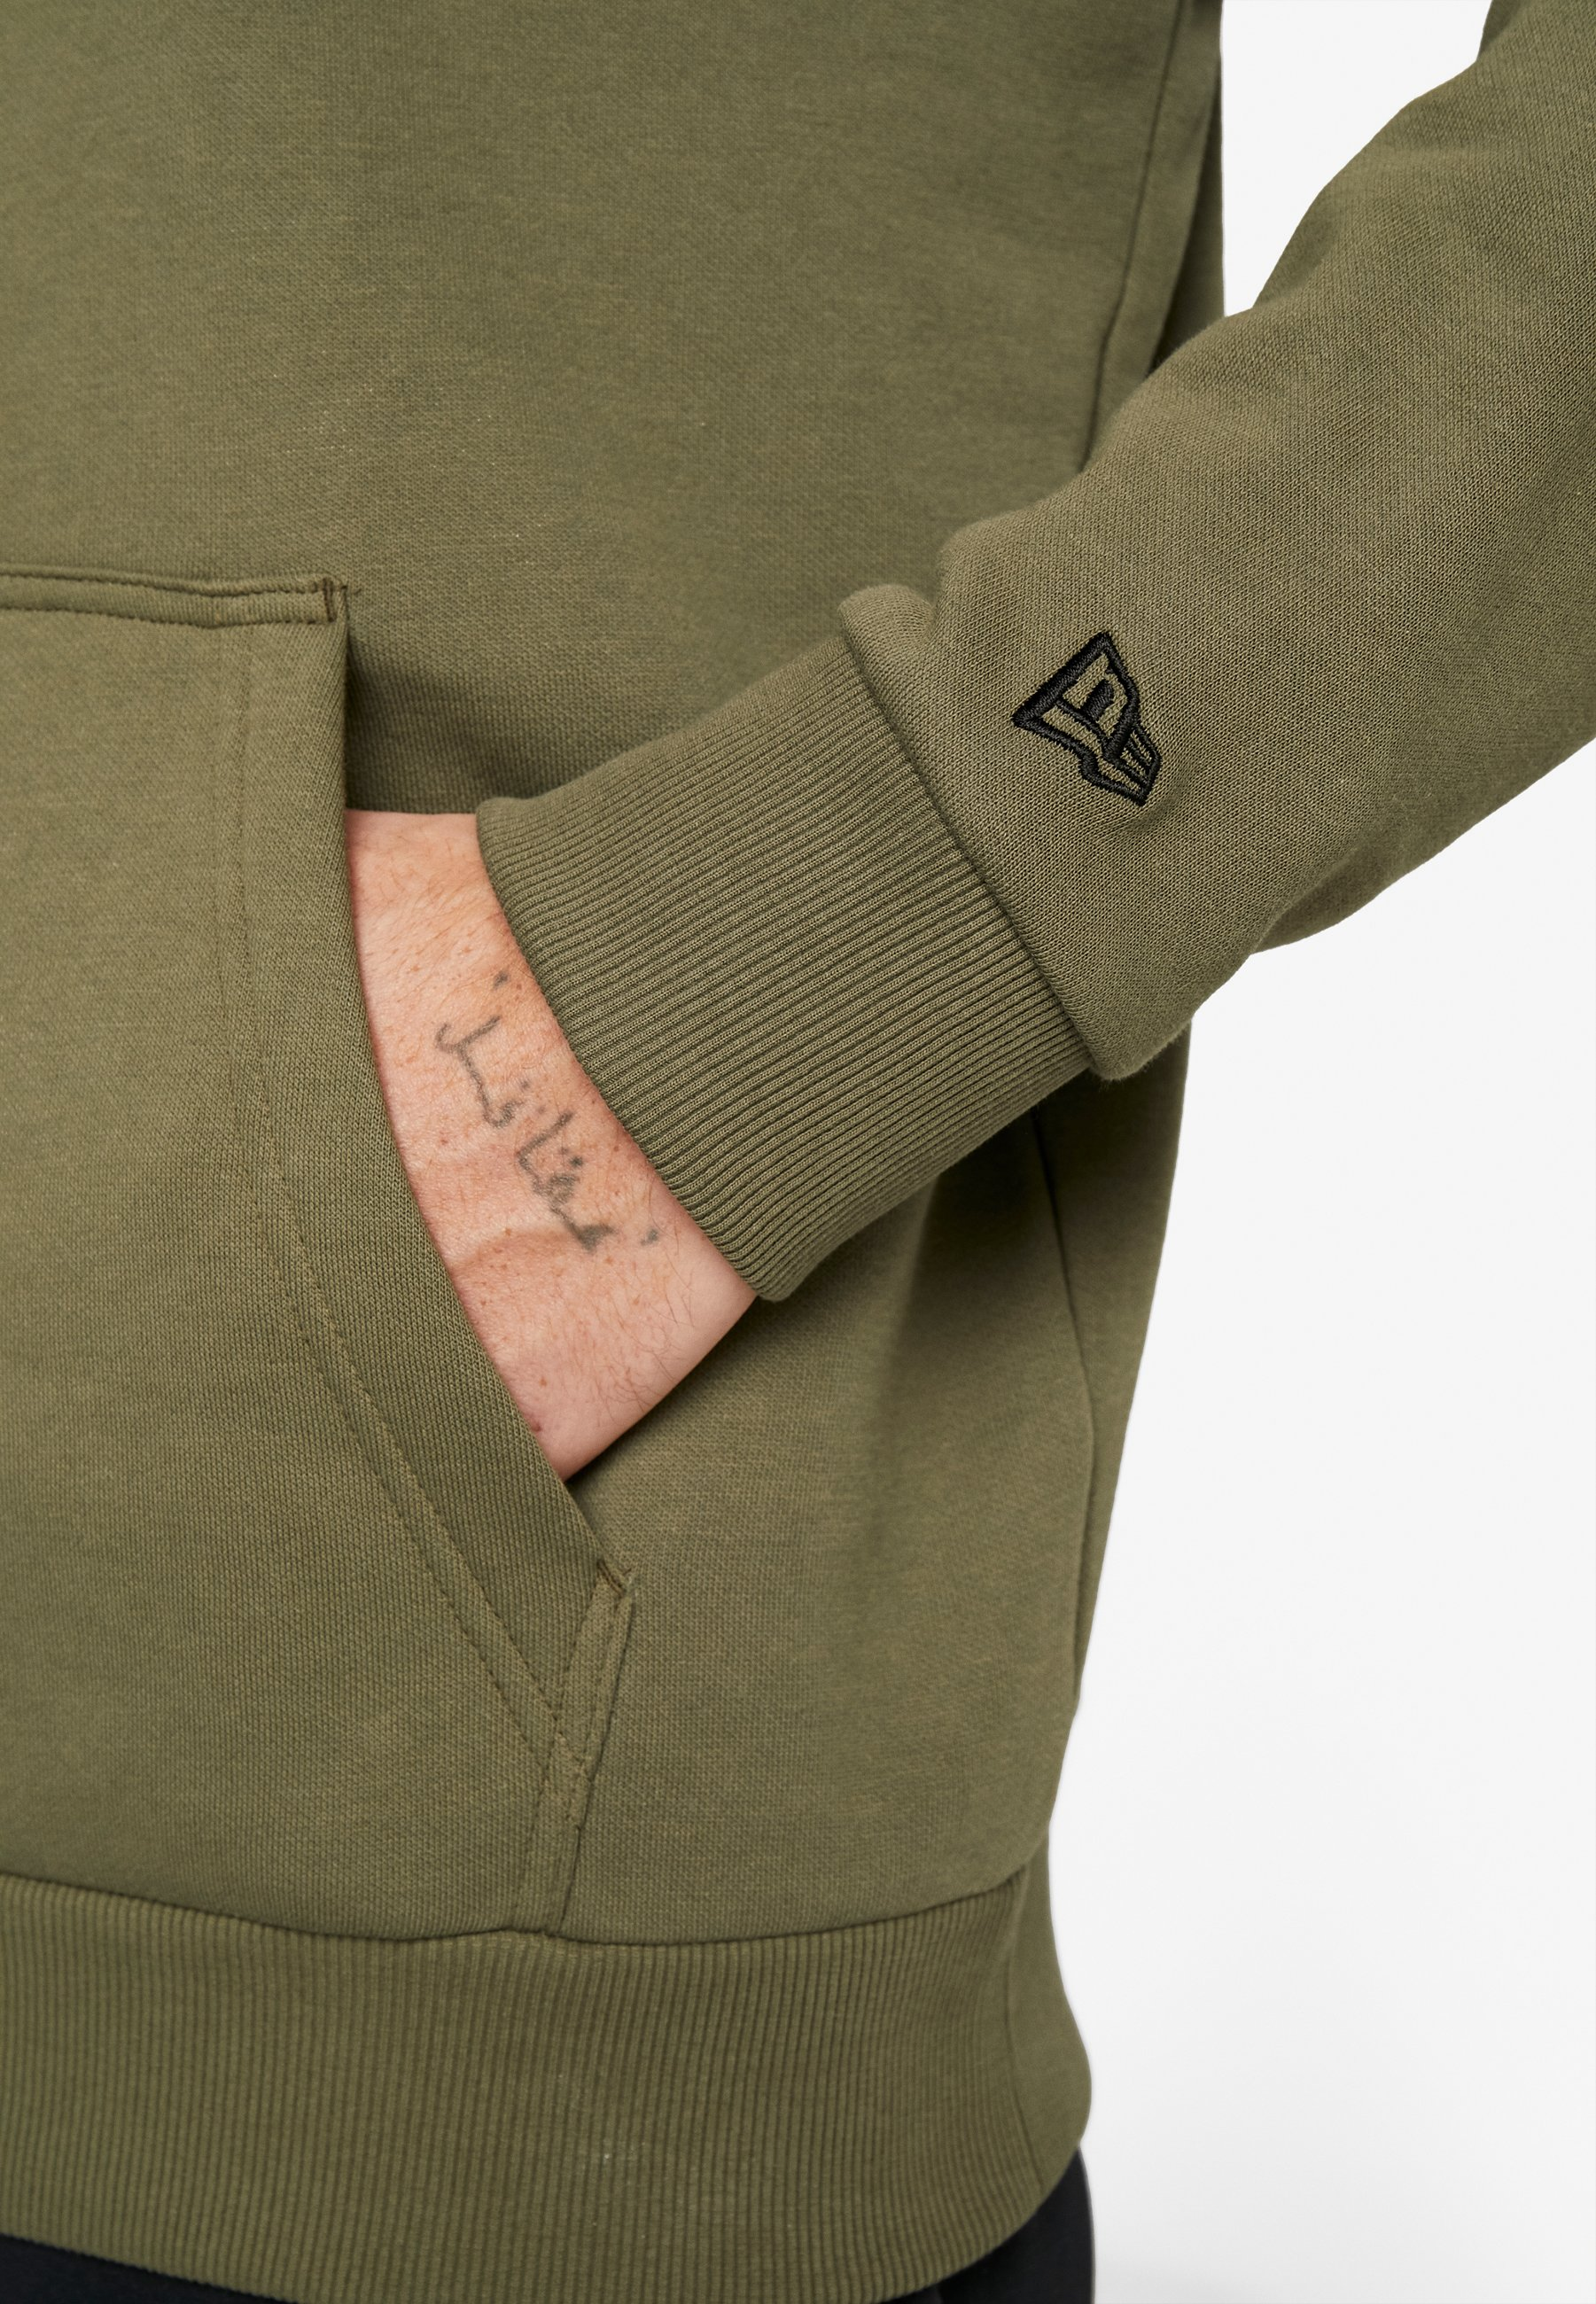 New Era Nfl England Patriots Camo Collection Hoody - Luvtröja Mottled Olive/khaki